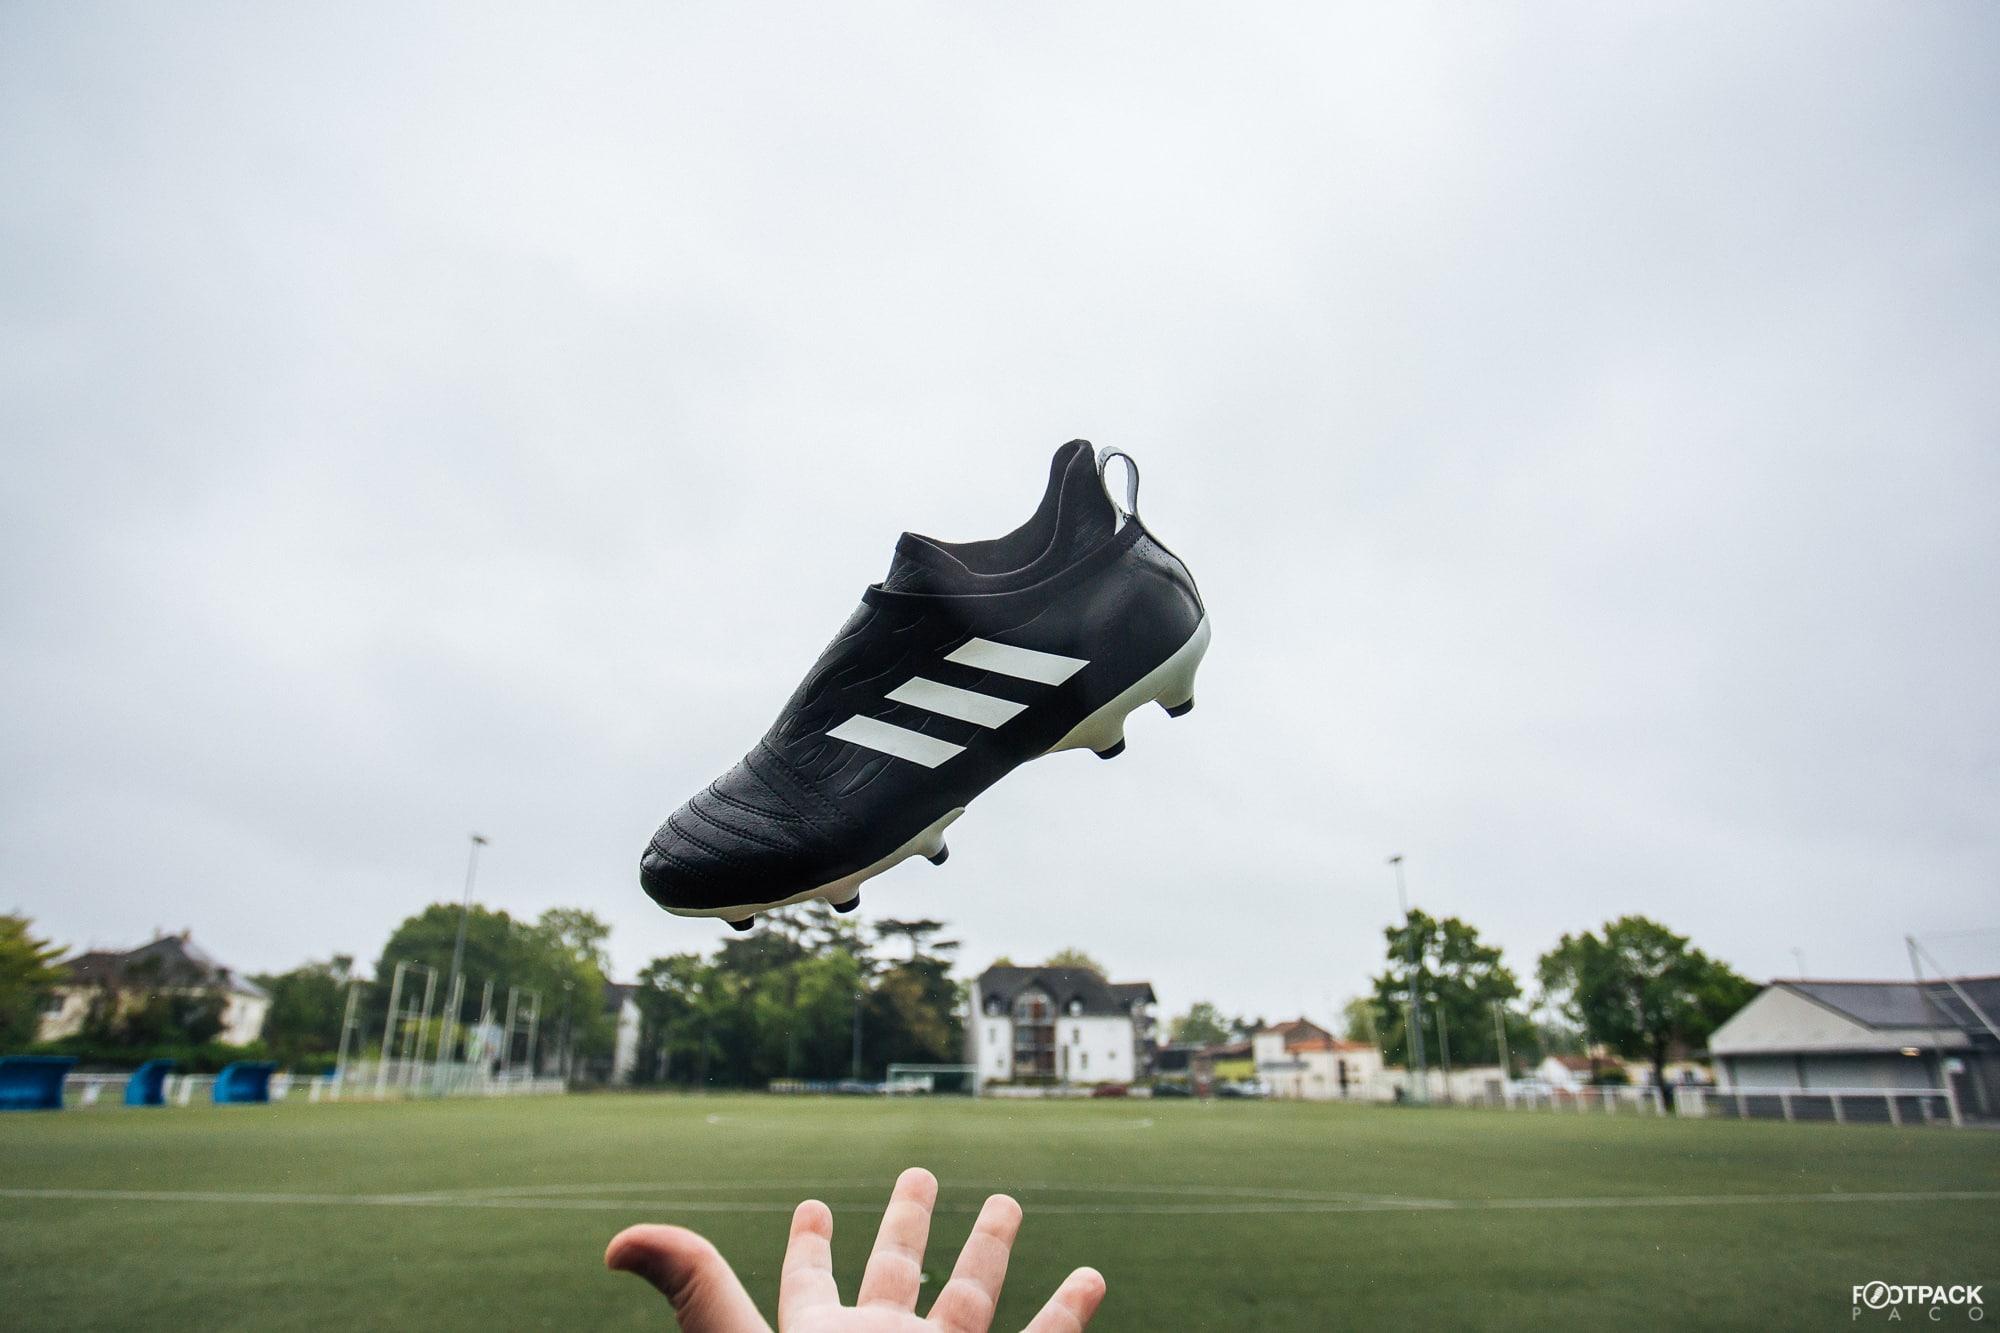 Chaussures-football-adidas-glitch-copa-mai-2018-1